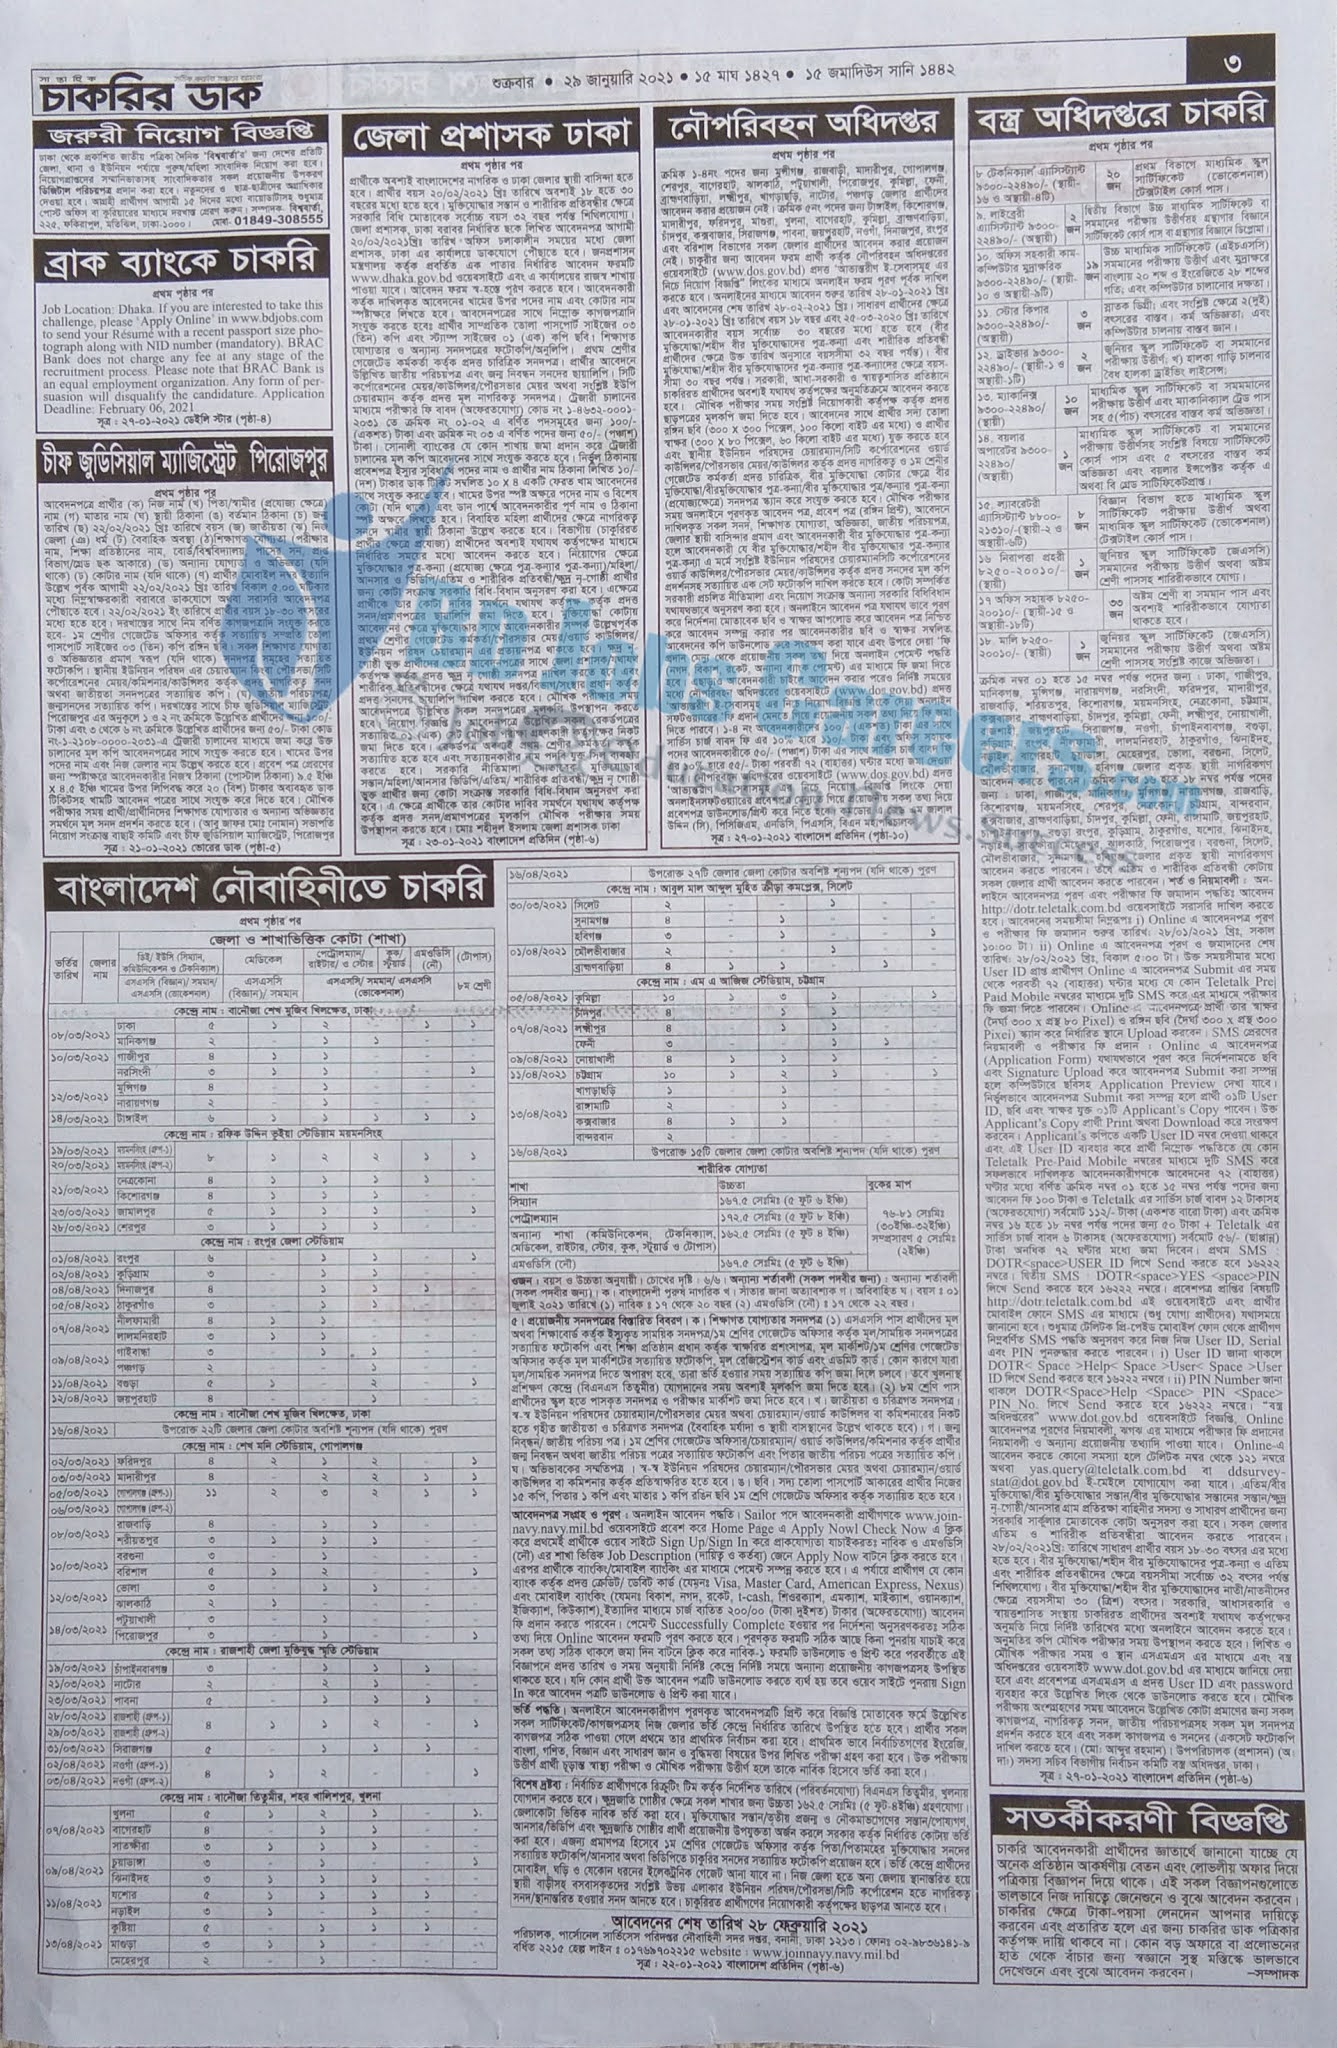 29 January 2021 Weekly Chakrir Dak Newspaper - সাপ্তাহিক চাকরির ডাক পত্রিকা ২৯ জানুয়ারি ২০২১